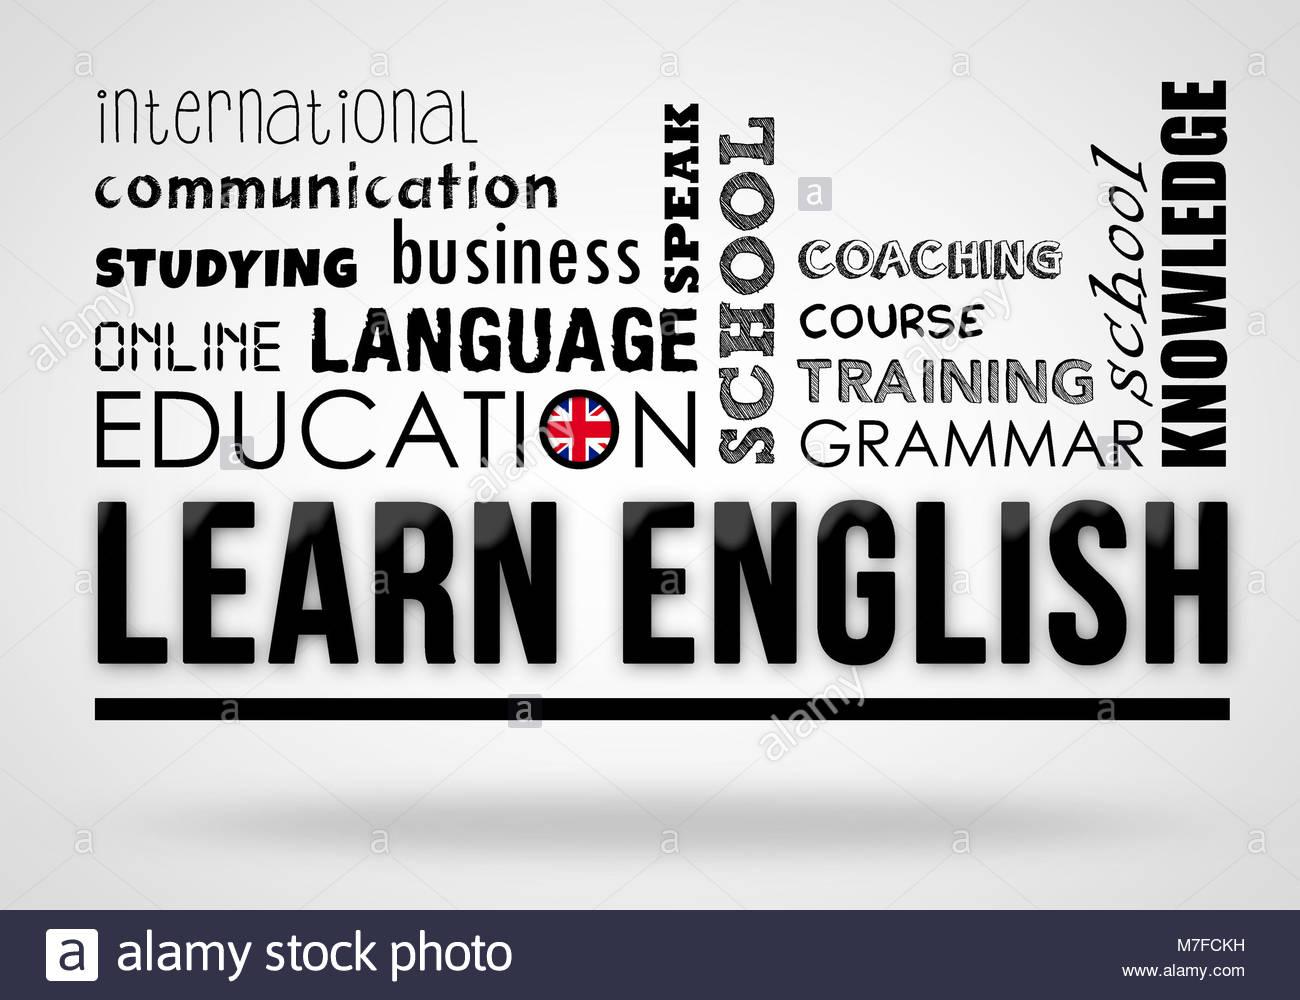 Aprender Ingles Concepto Motivacional Foto Imagen De